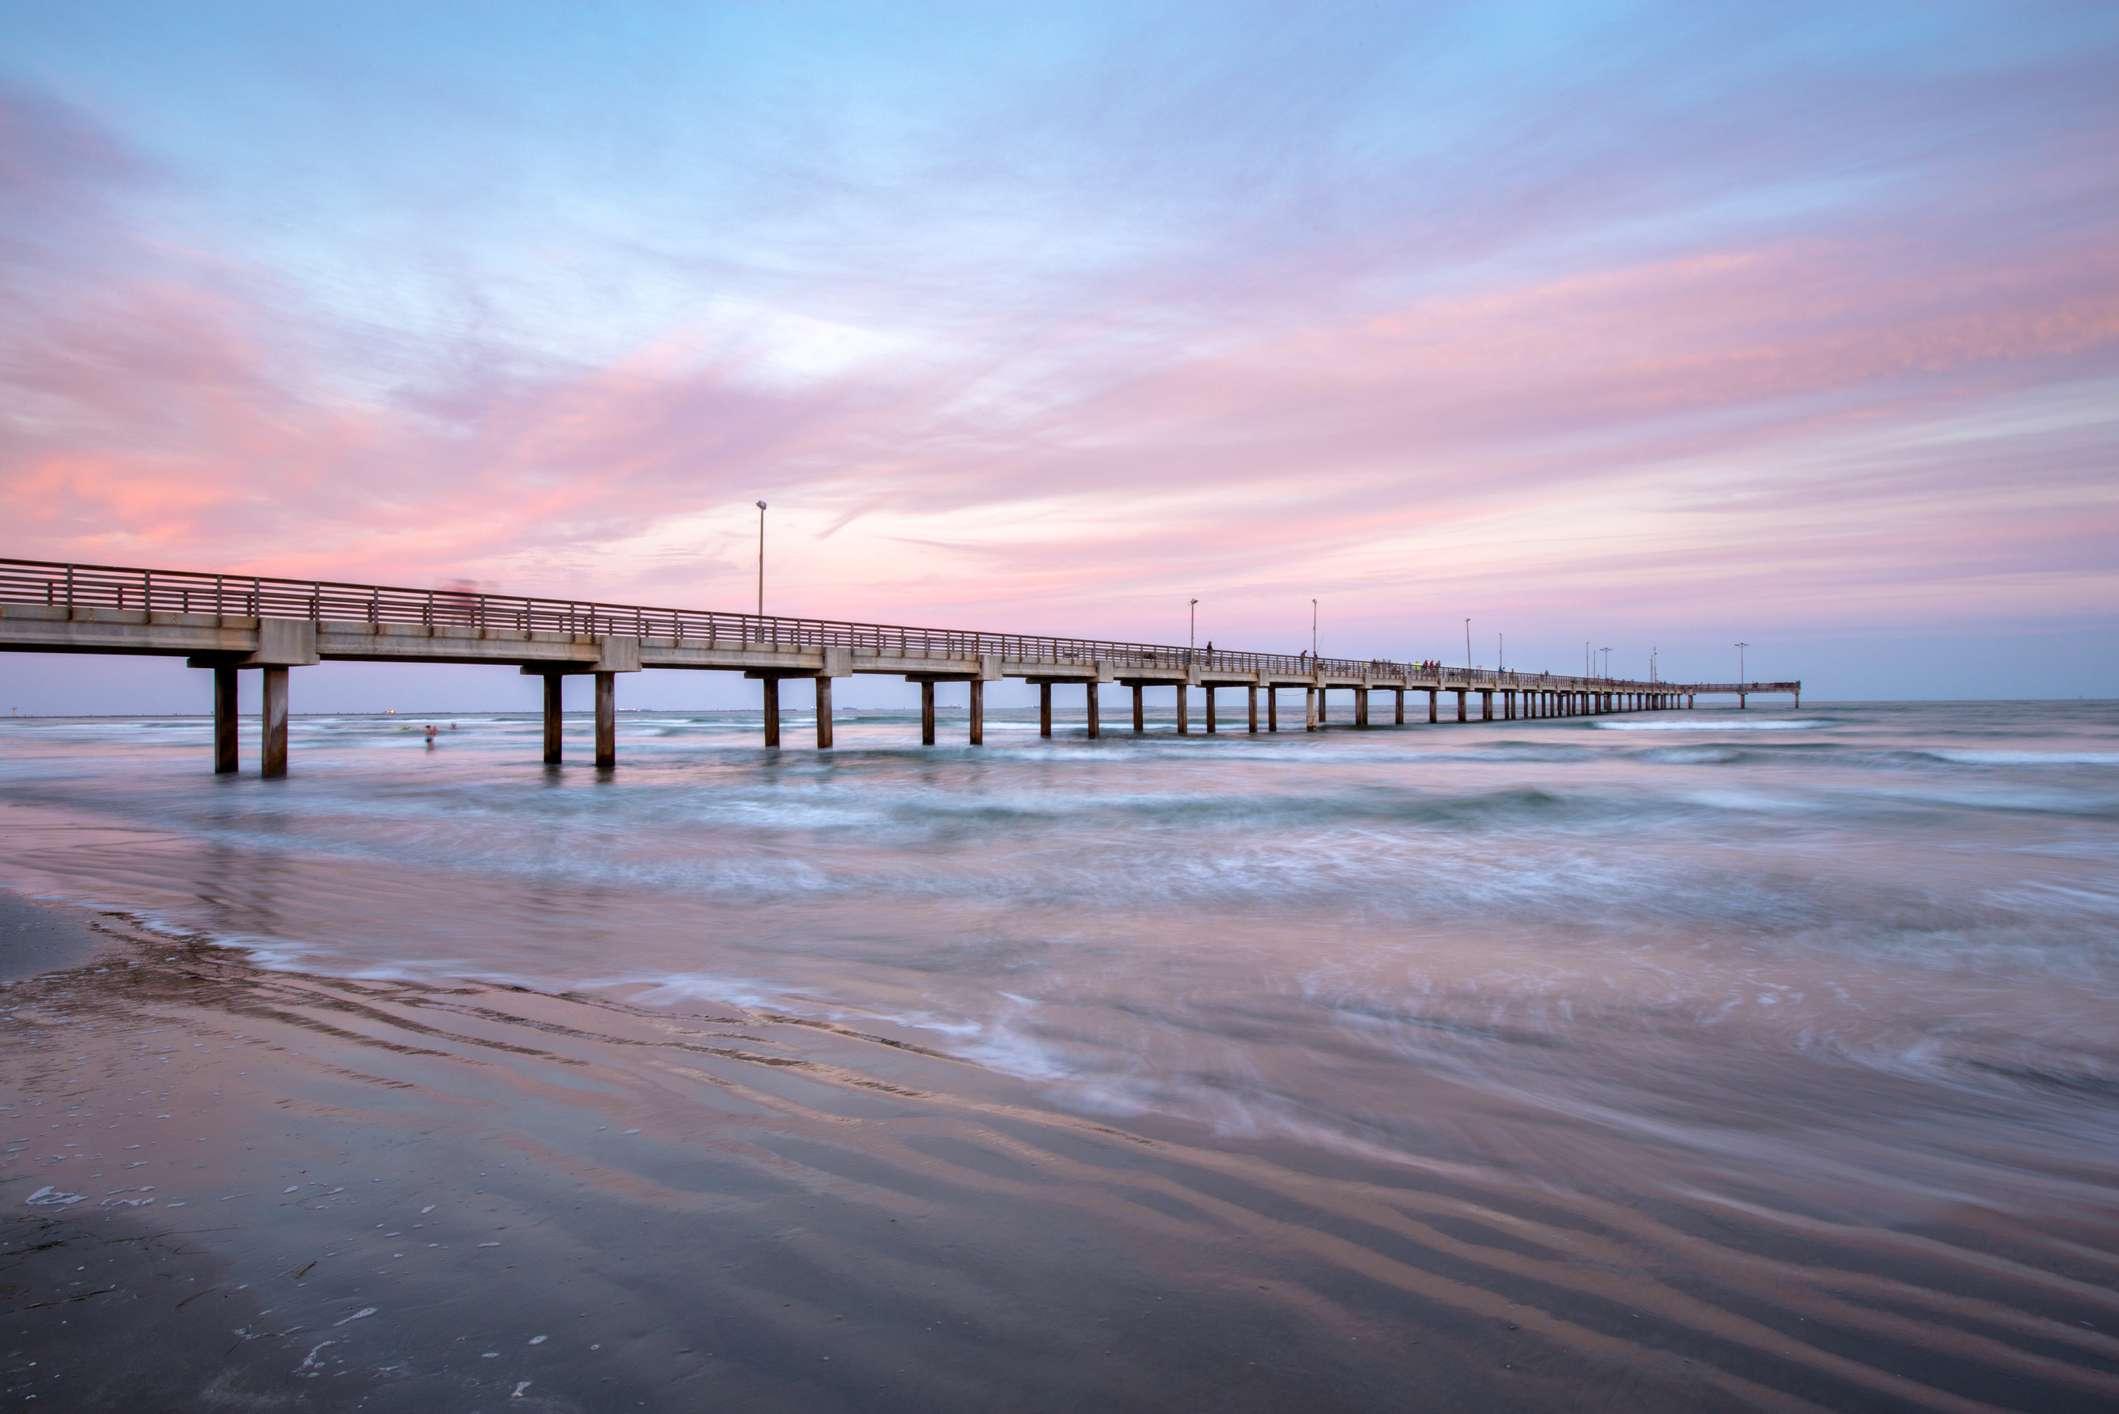 Horace Caldwell Pier at Sunset in Port Aransas, Texas, USA